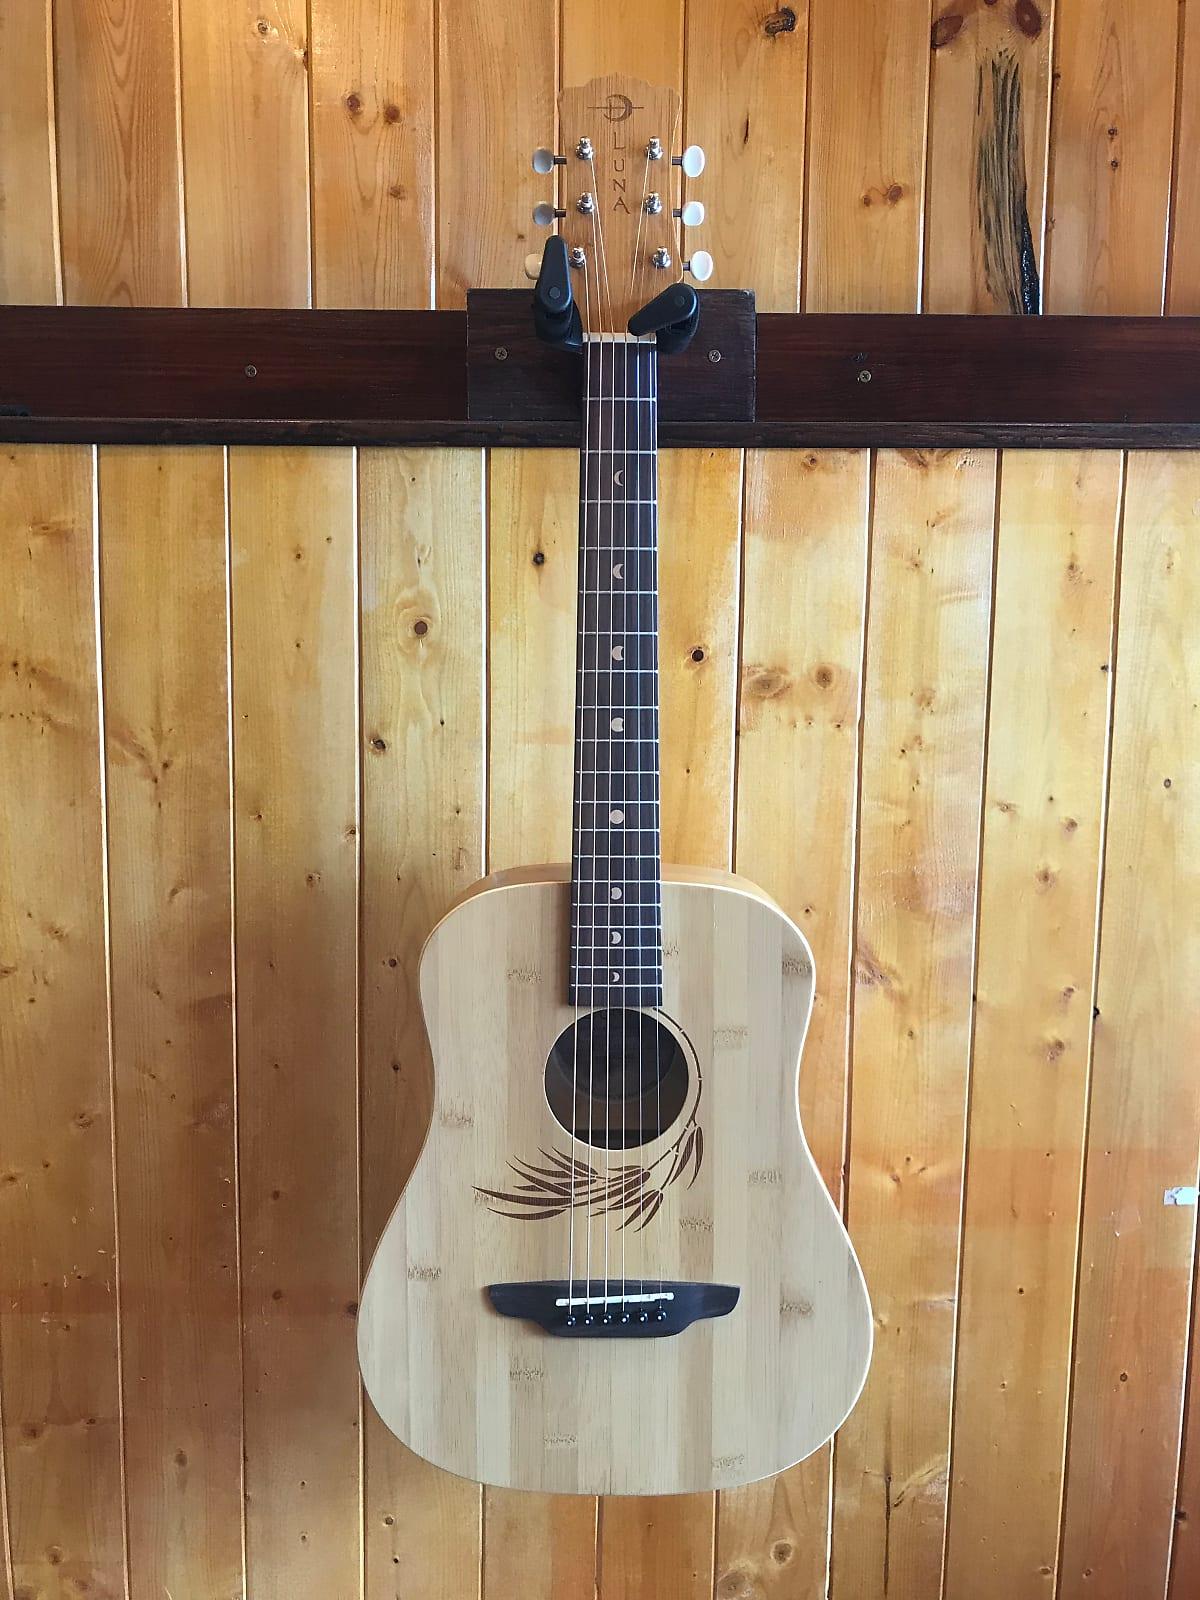 65a3f44f22 Luna Safari Bamboo Travel Guitar w/Gigbag